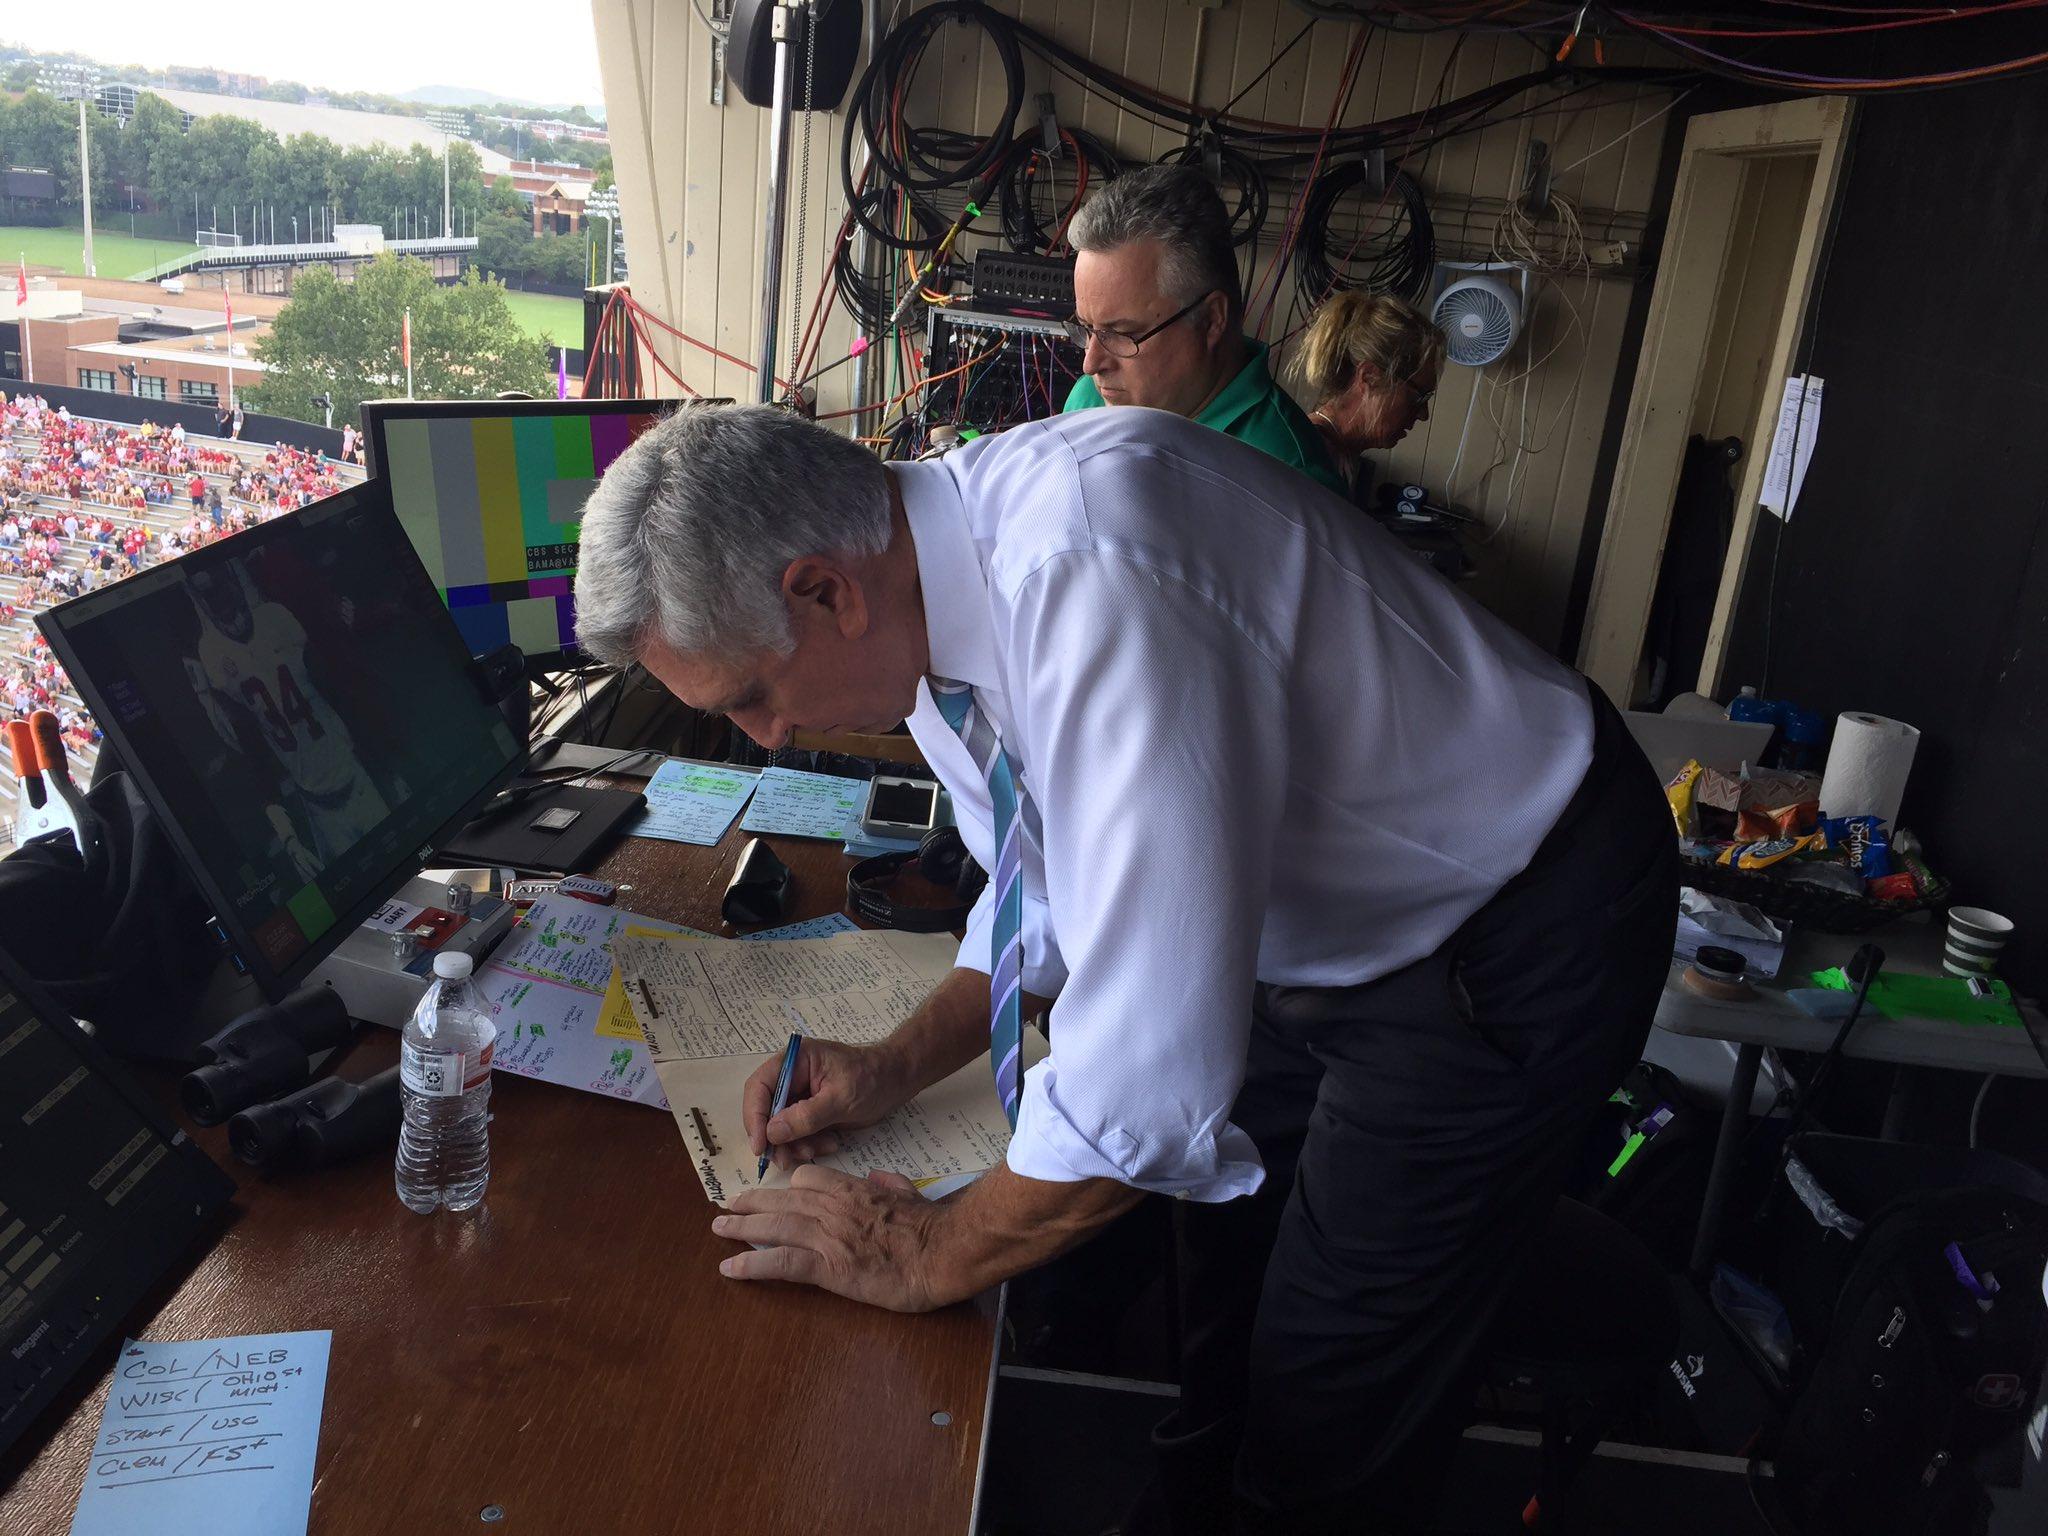 Gary's final prep work before kickoff. Let's do this #BAMAvsVandy at 2:30CT on CBS @Bama @VandyFootball @SEConCBS https://t.co/x11NZ5ERMV